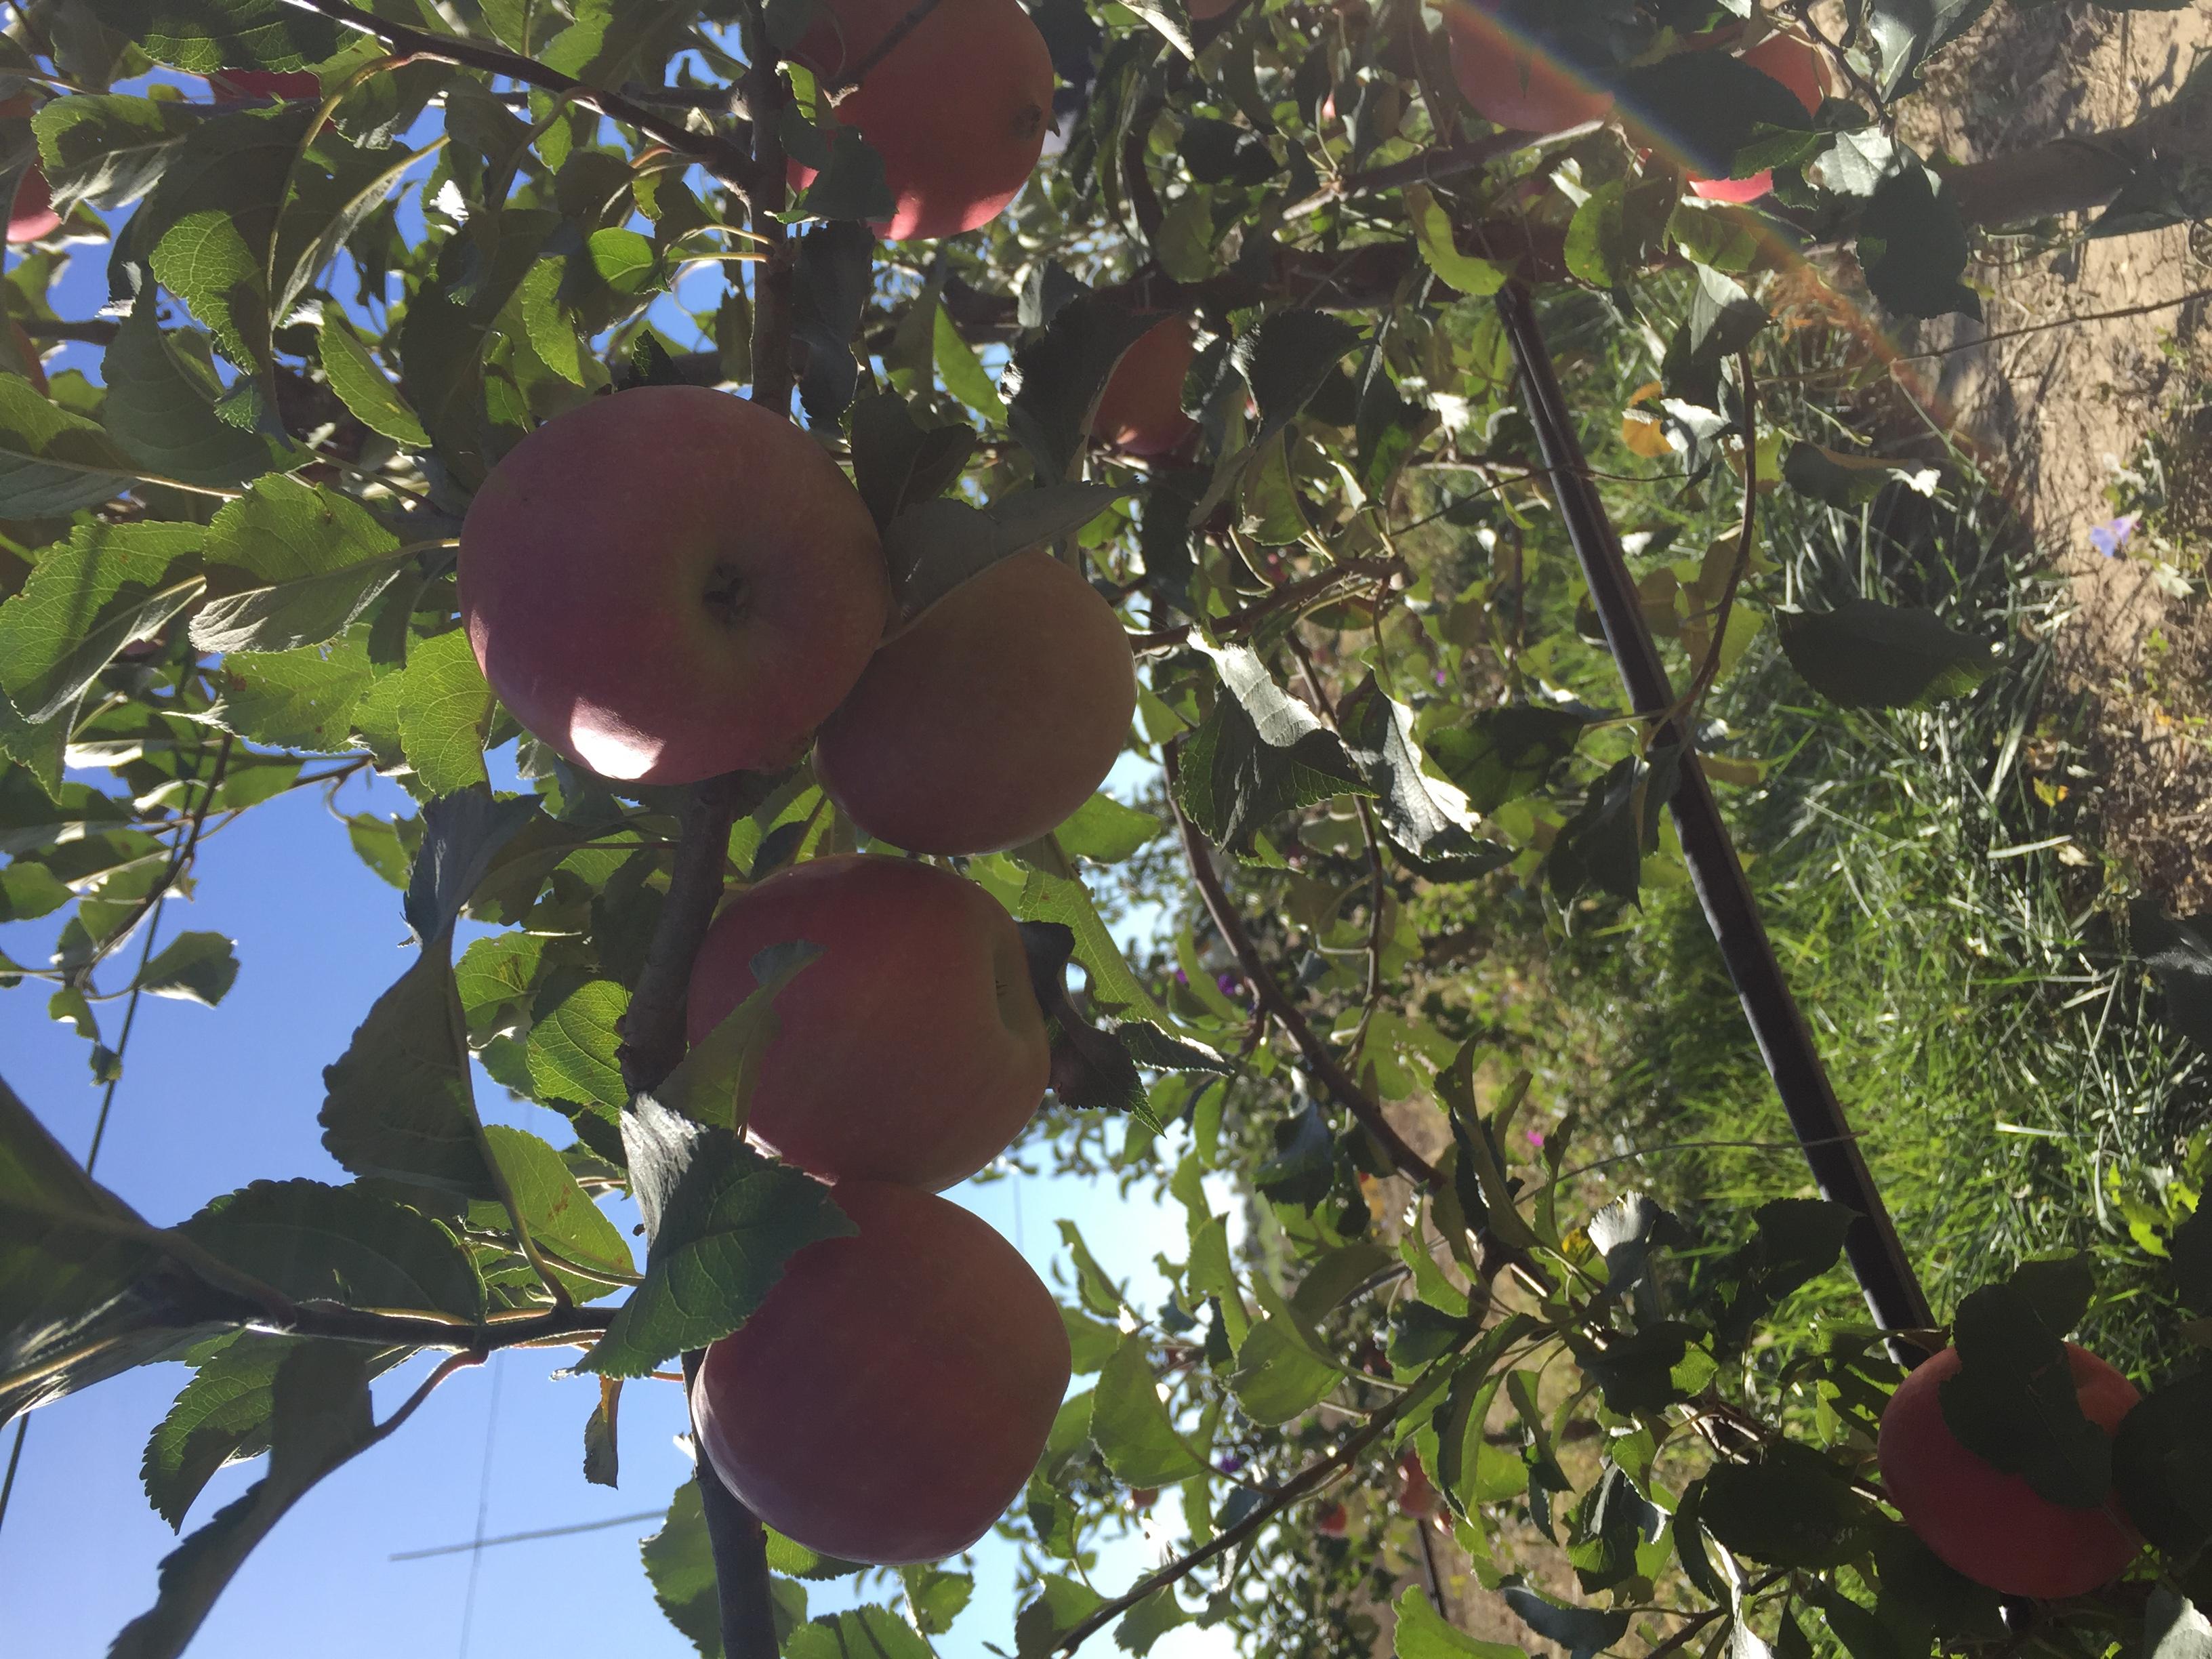 Apple Picking at Vala's Pumpkin Patch